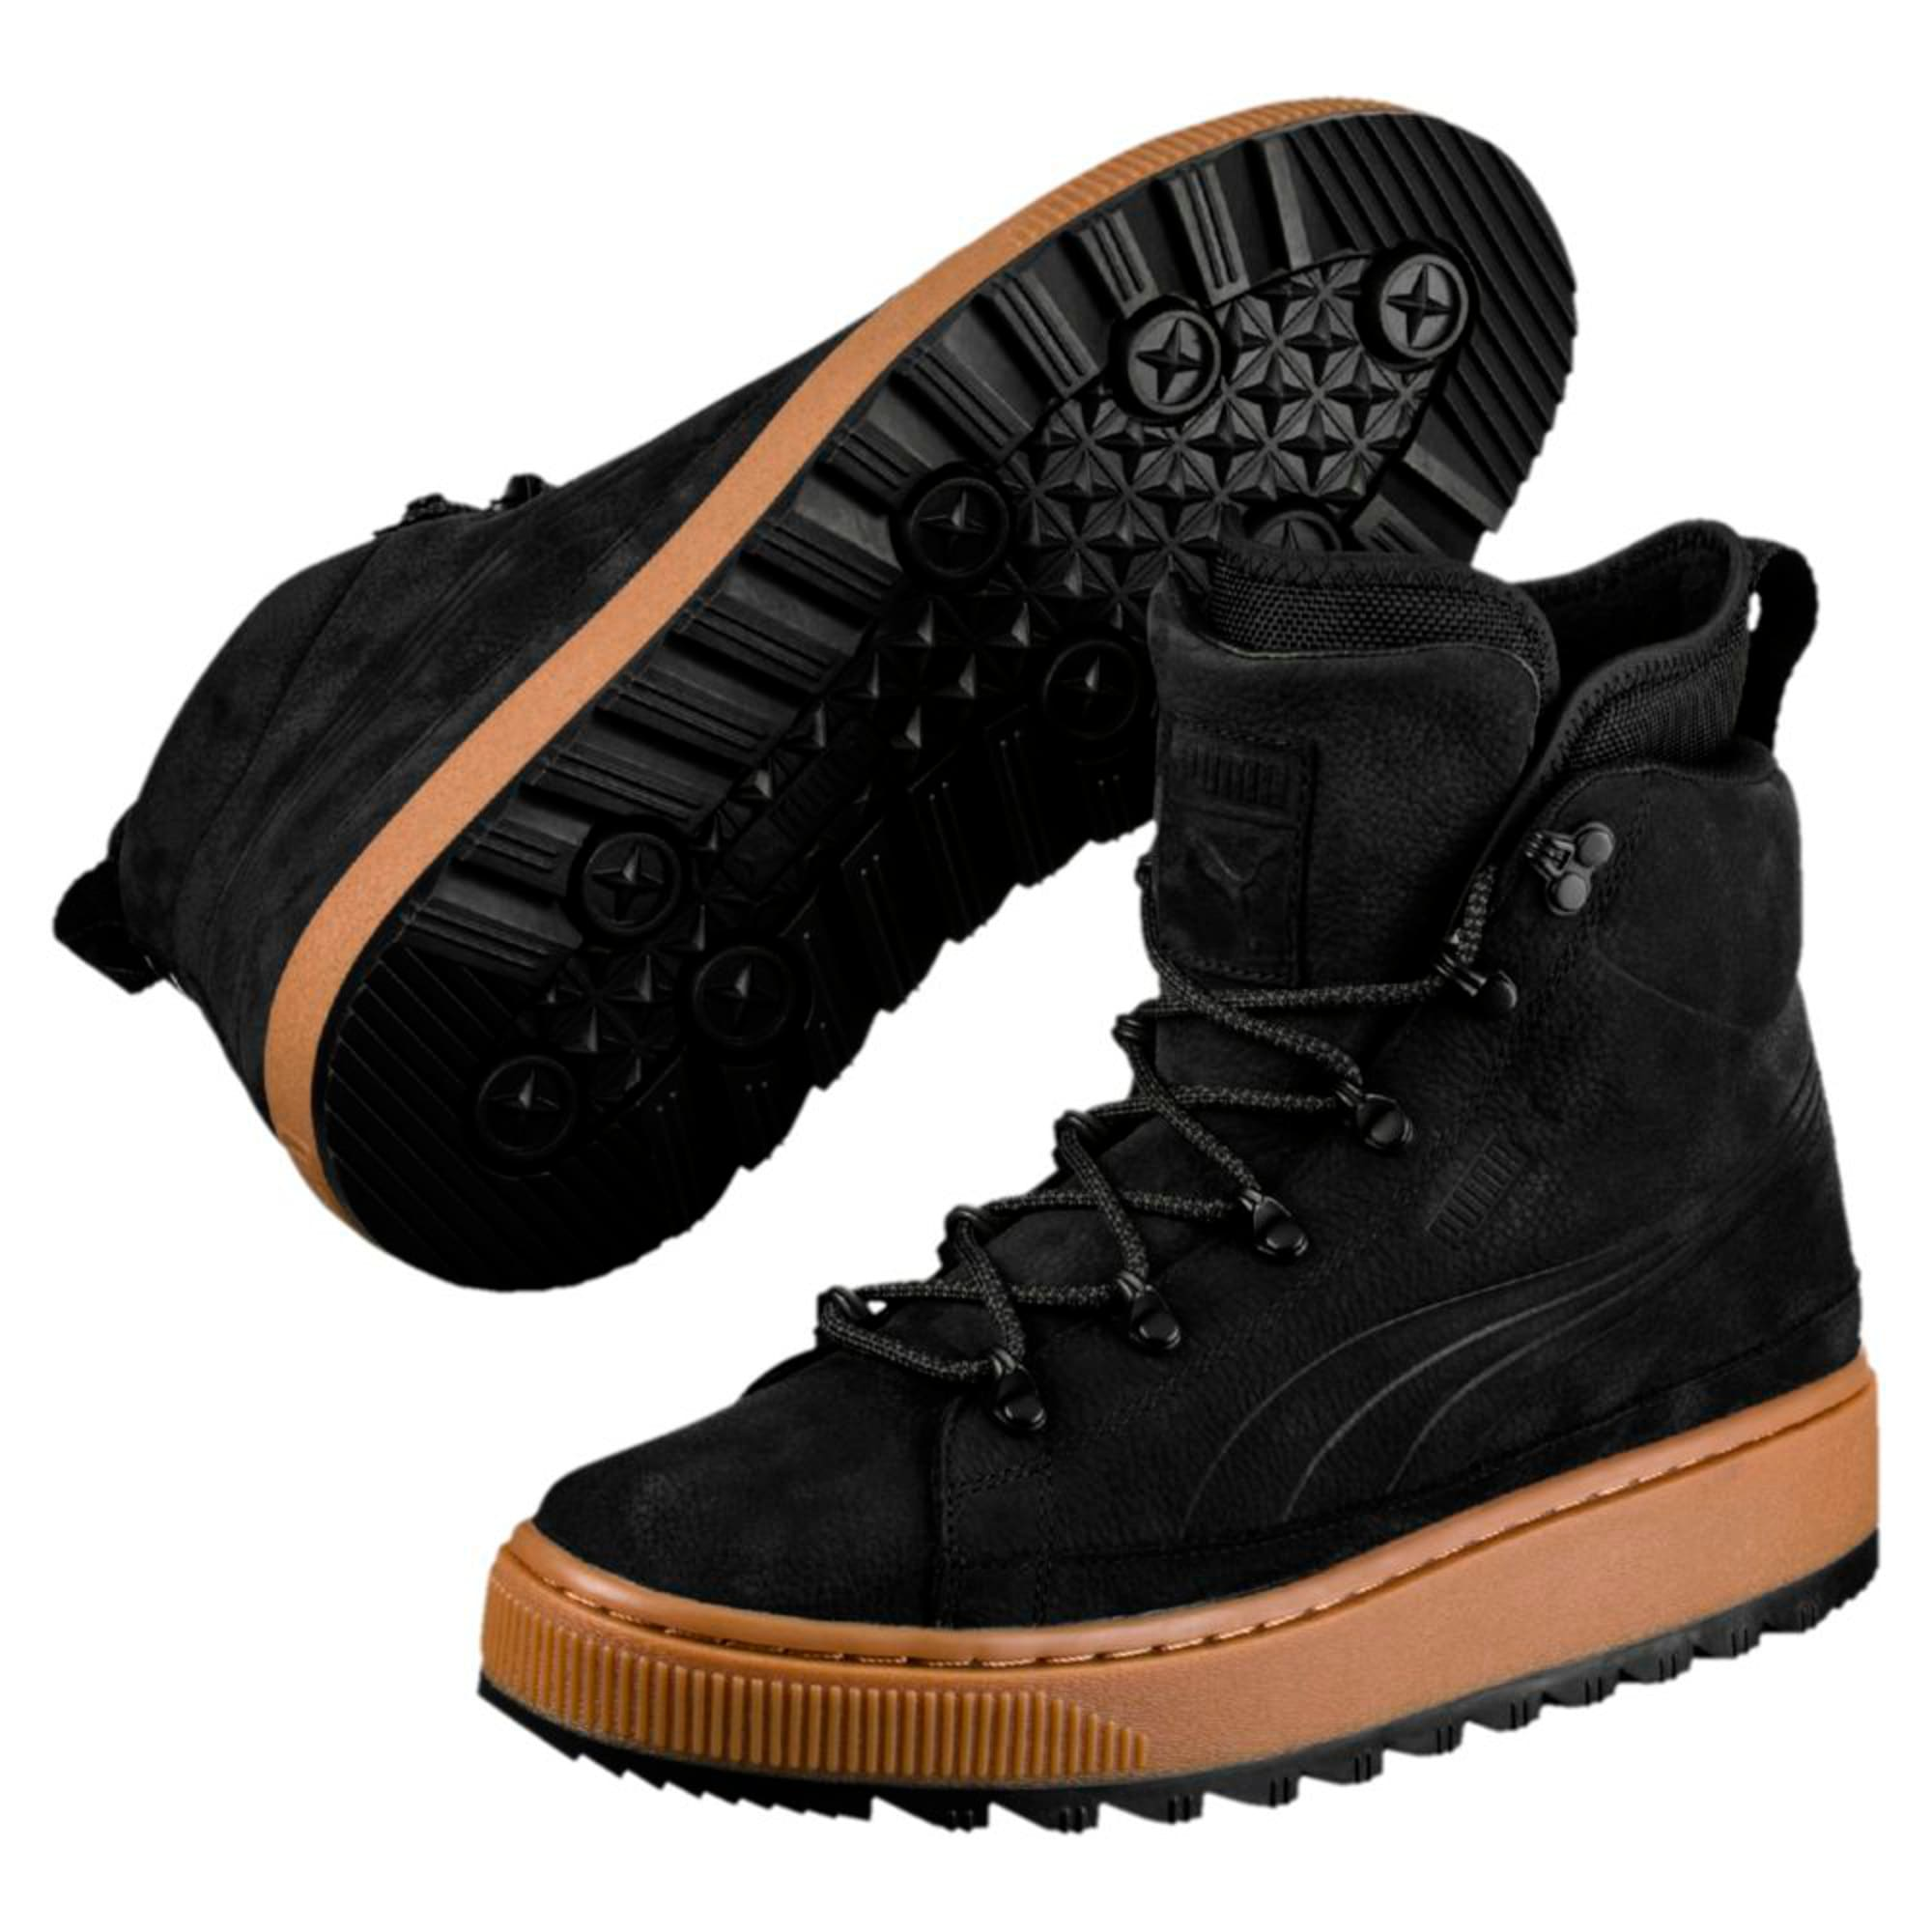 Thumbnail 3 of The Ren Boots, Puma Black, medium-IND